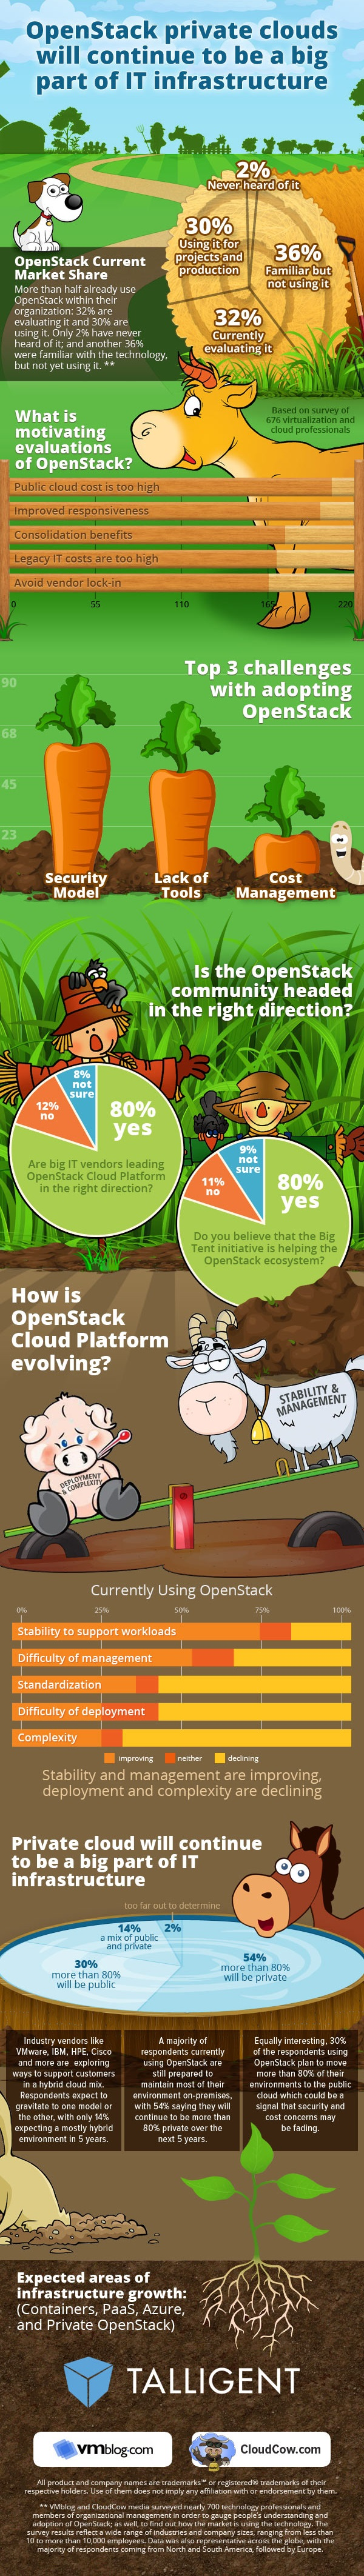 Talligent OpenStack Infographic